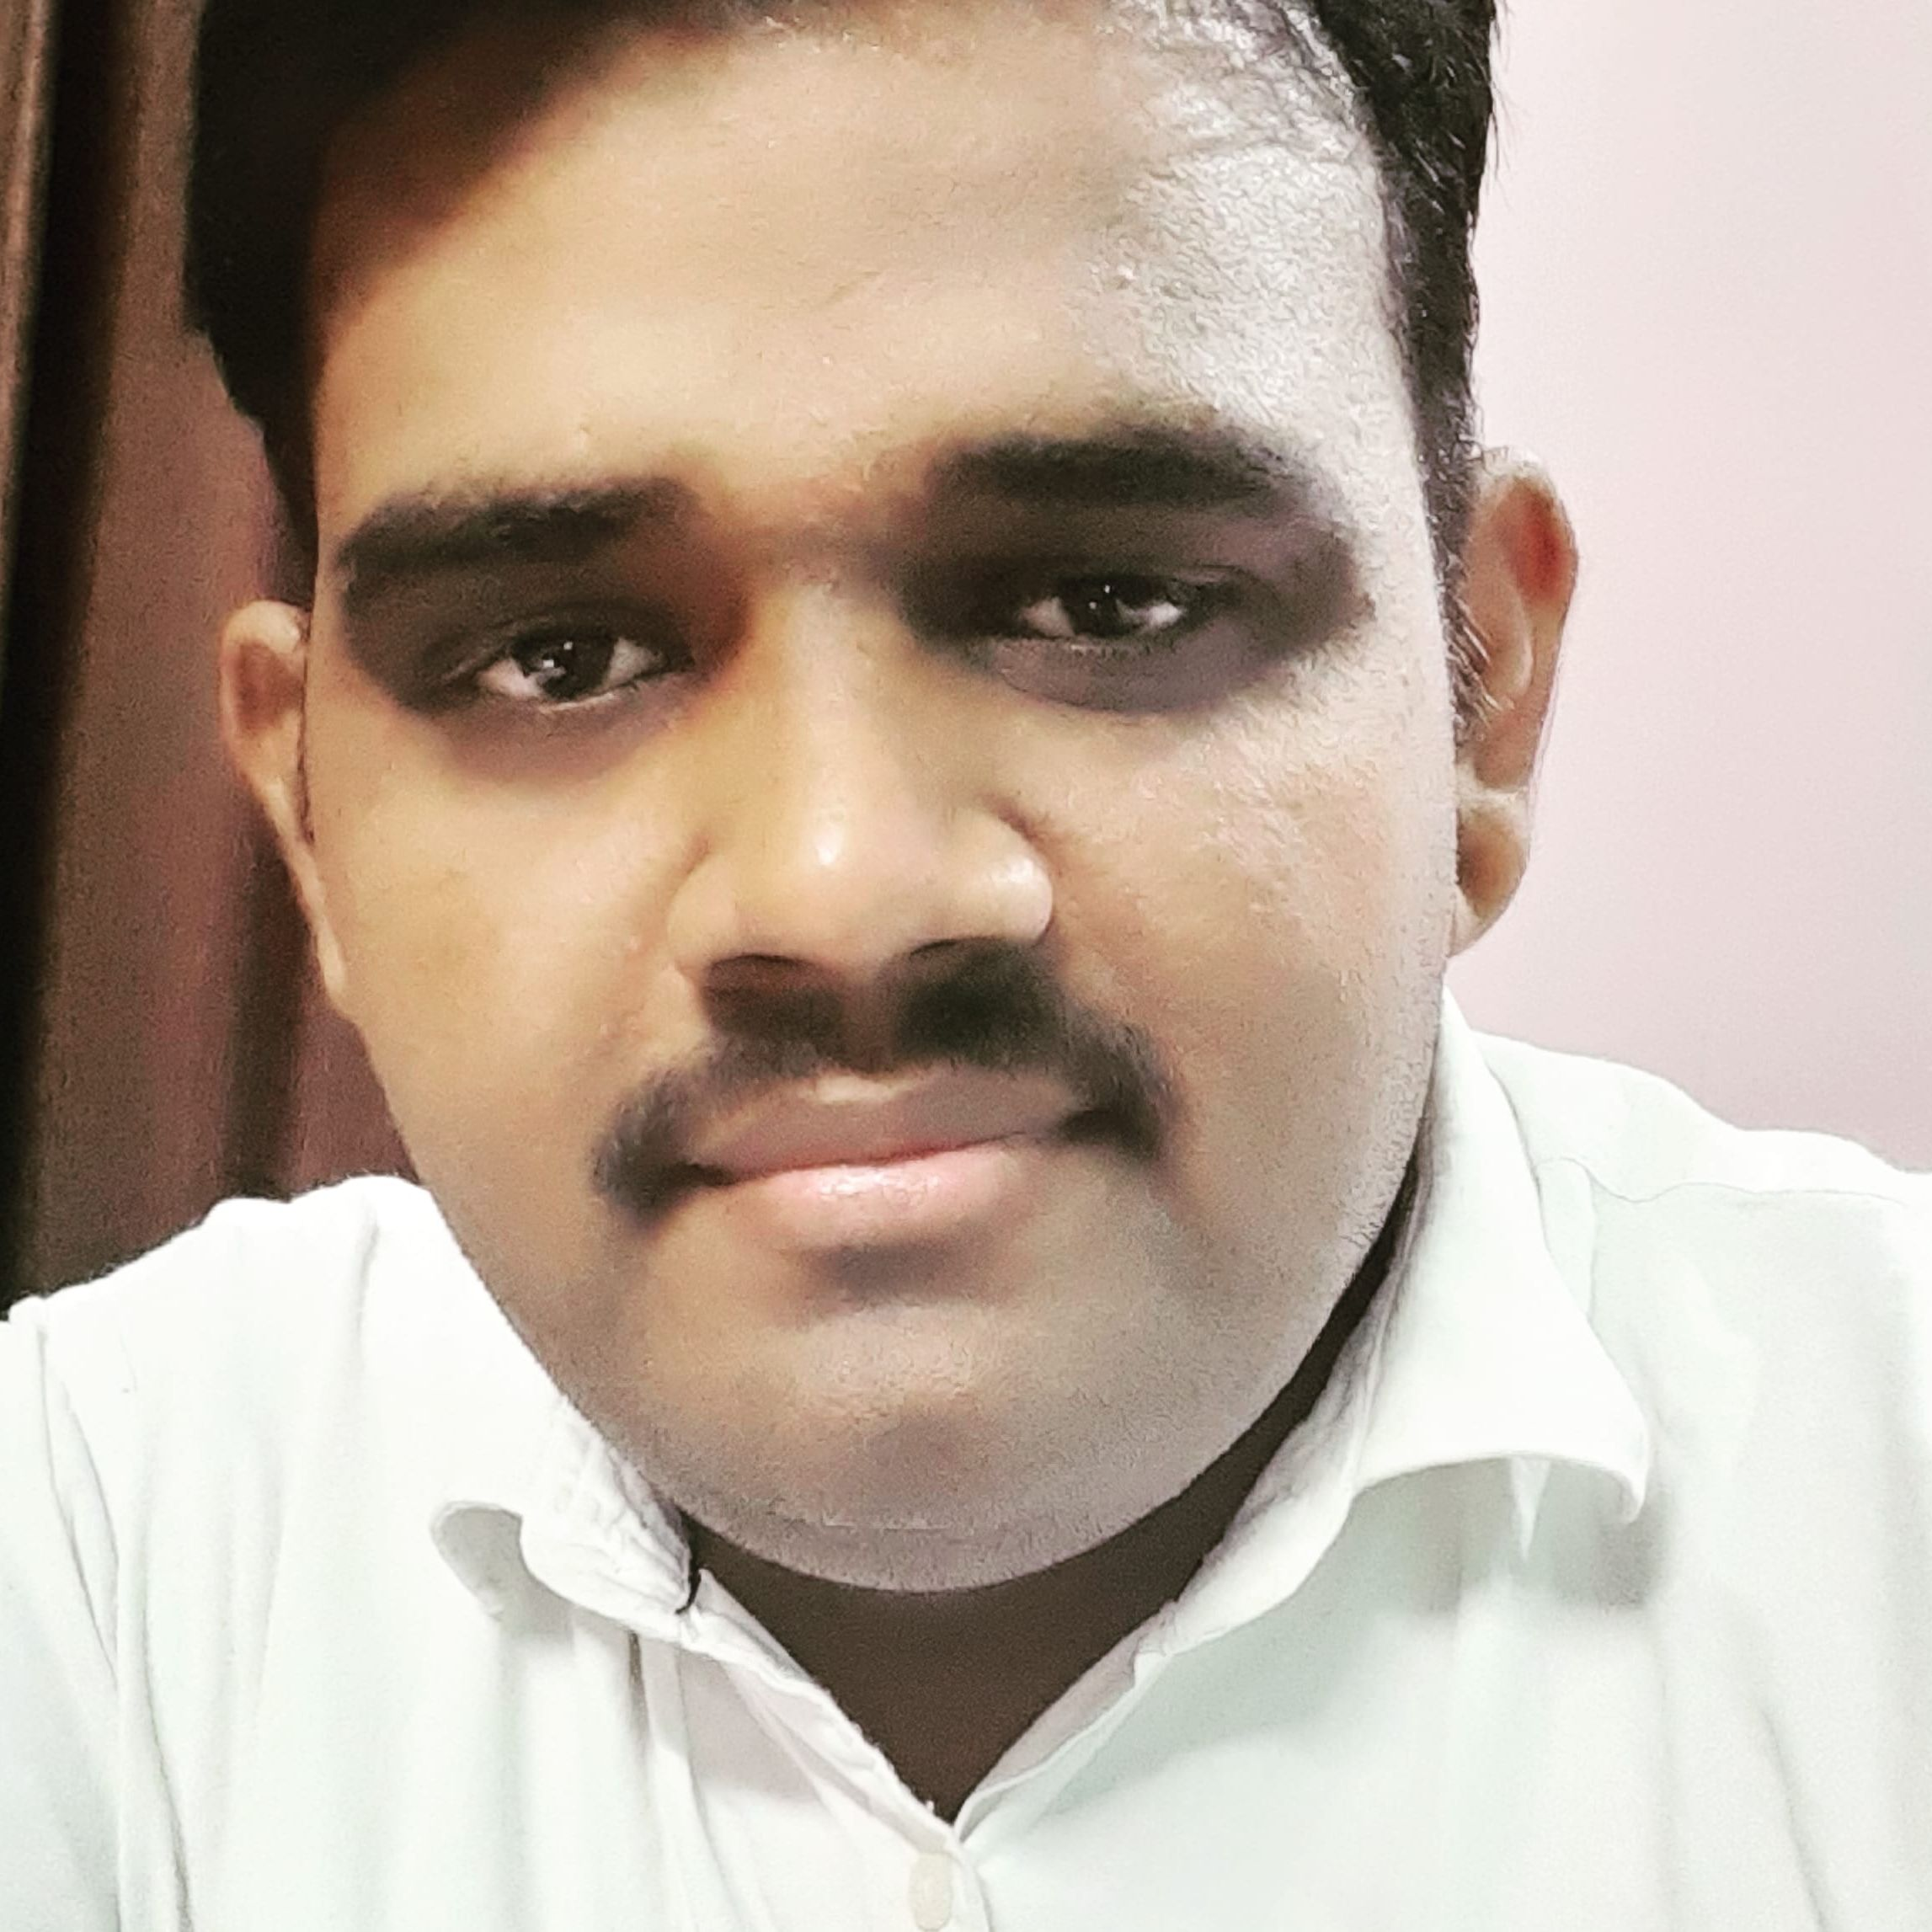 Phool Kanwar